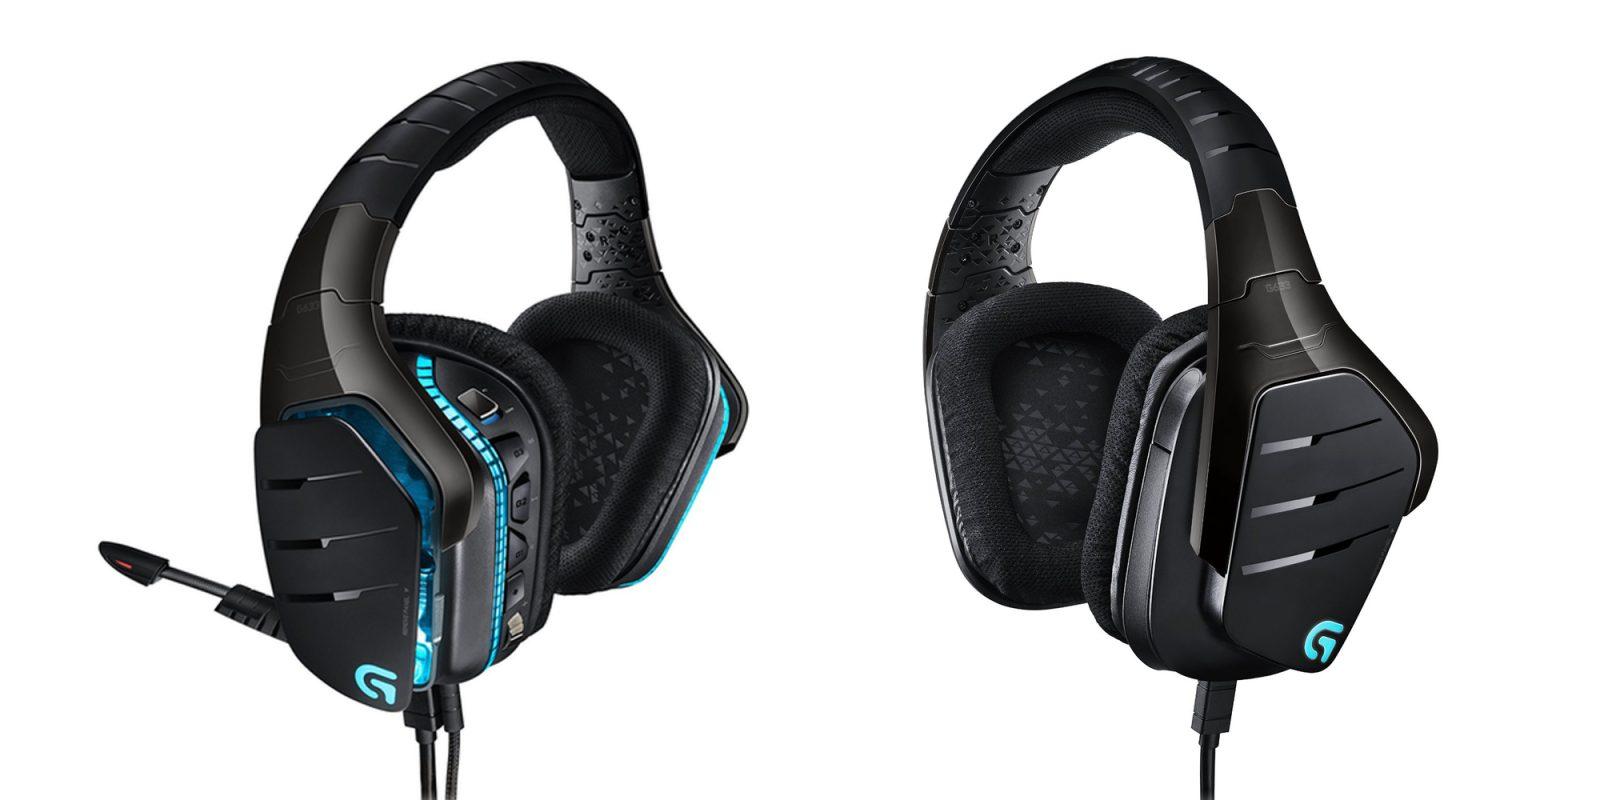 cf06c1be18b Logitech G633 Artemis Spectrum Gaming Headset for $70 shipped (Reg. $100)